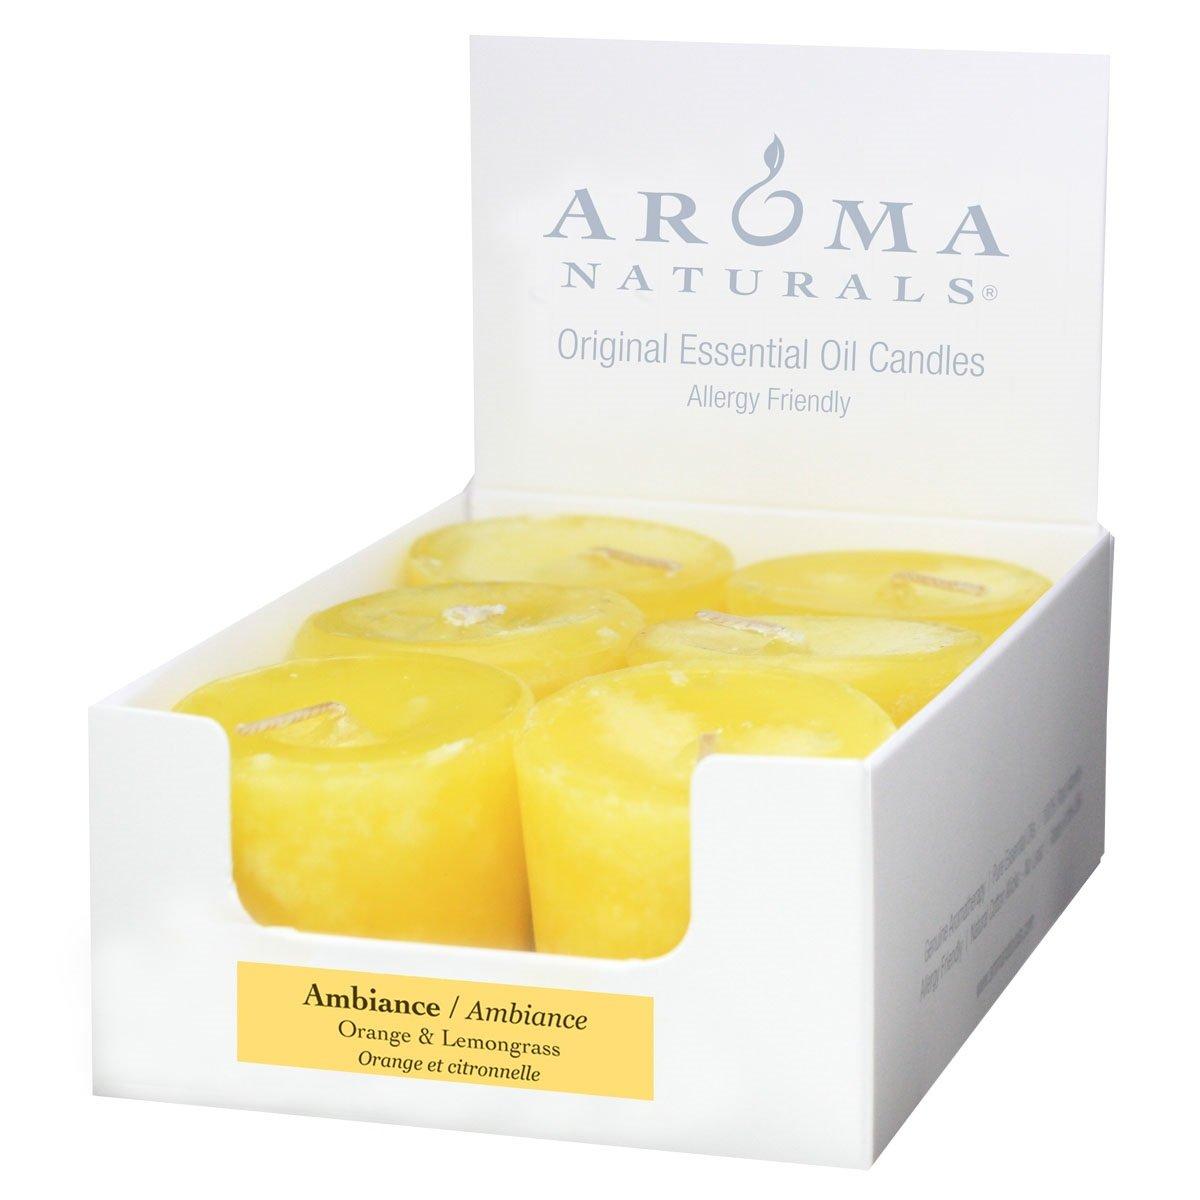 Aroma Naturals Ambiance Votive Candle, Yellow/Orange/Lemongrass, 6 Count